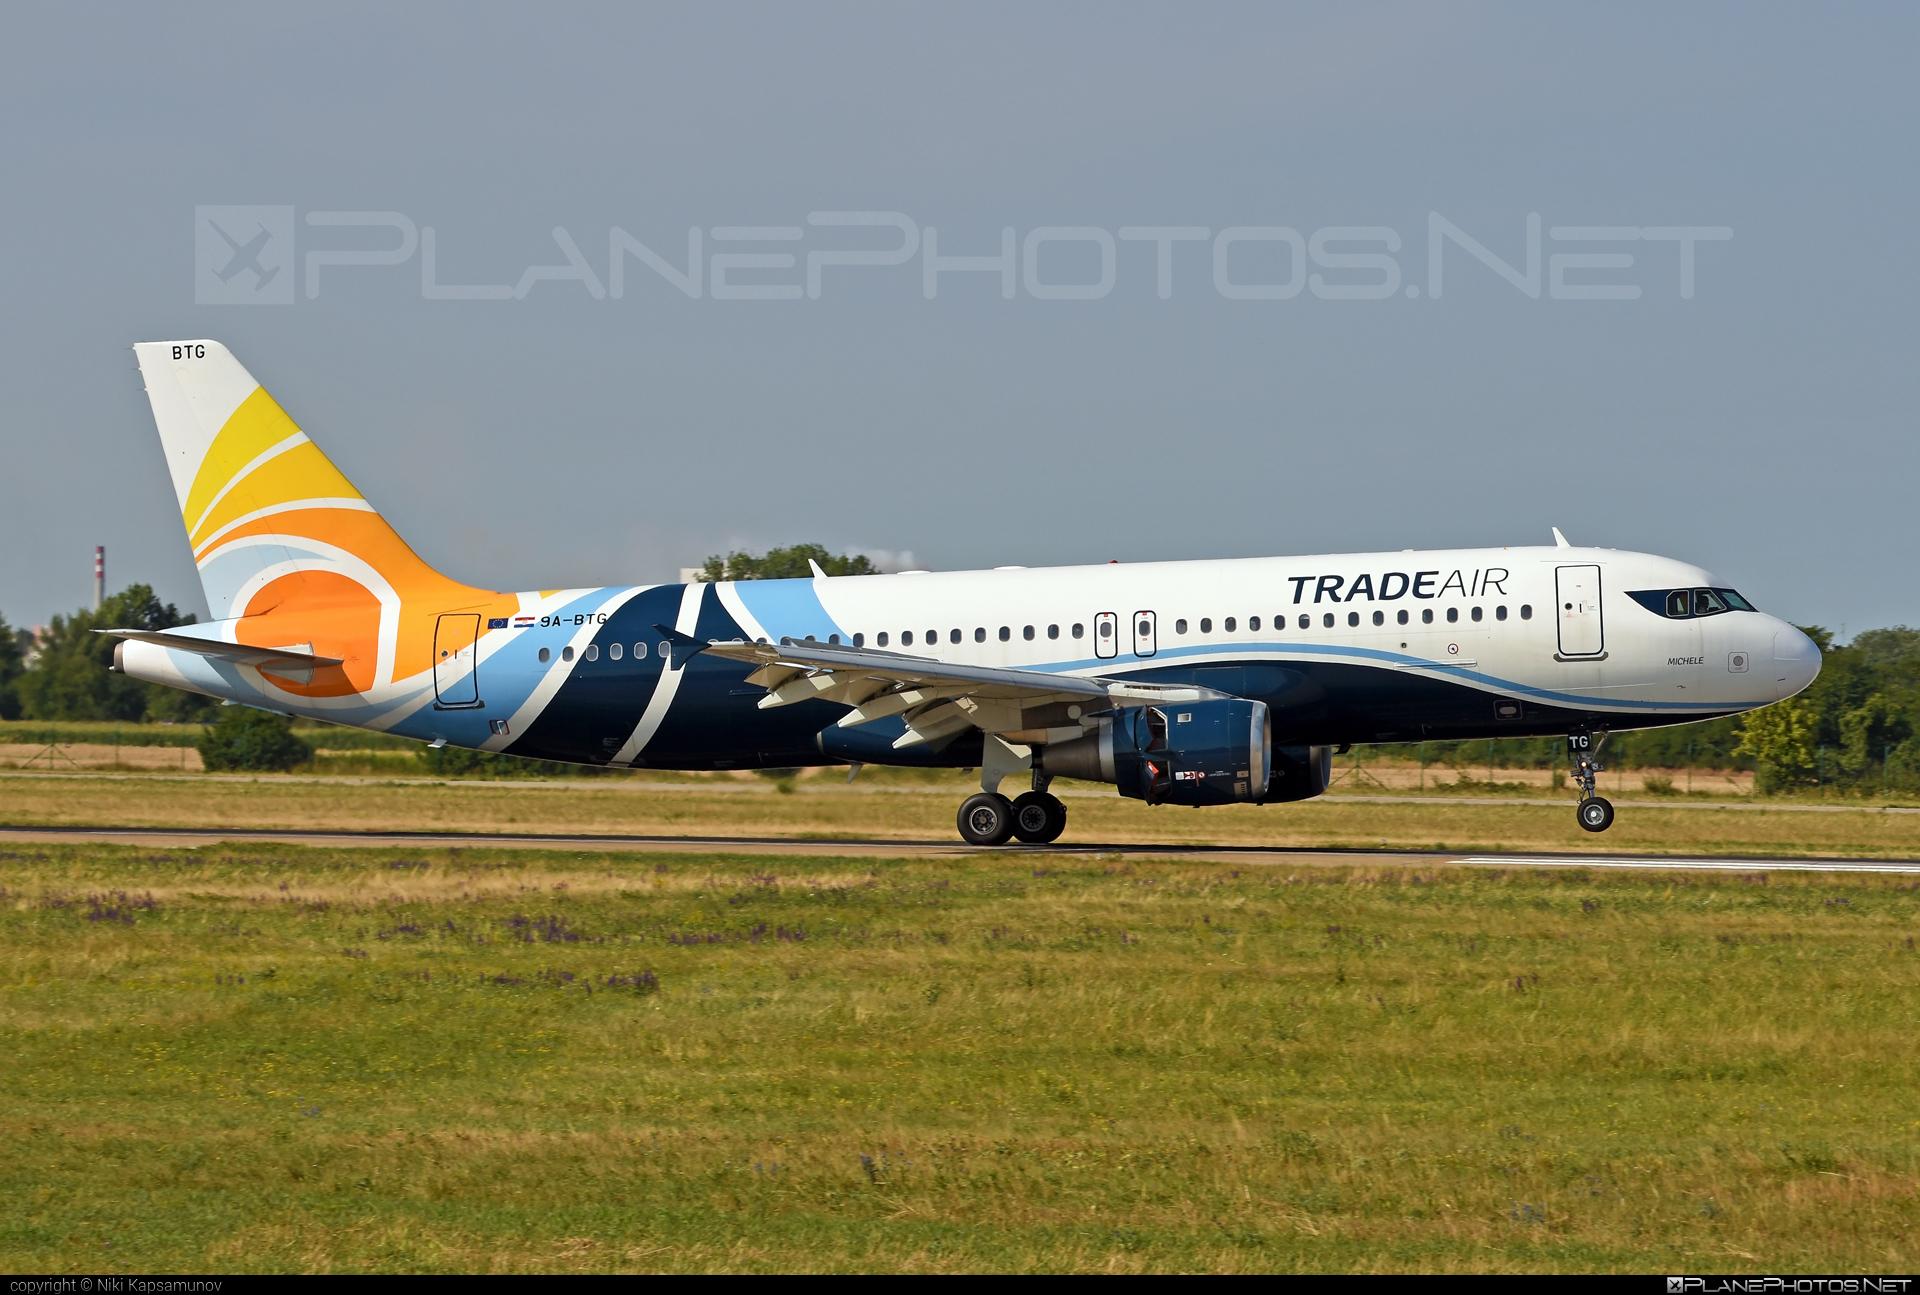 Airbus A320-212 - 9A-BTG operated by Trade Air #TradeAir #a320 #a320family #airbus #airbus320